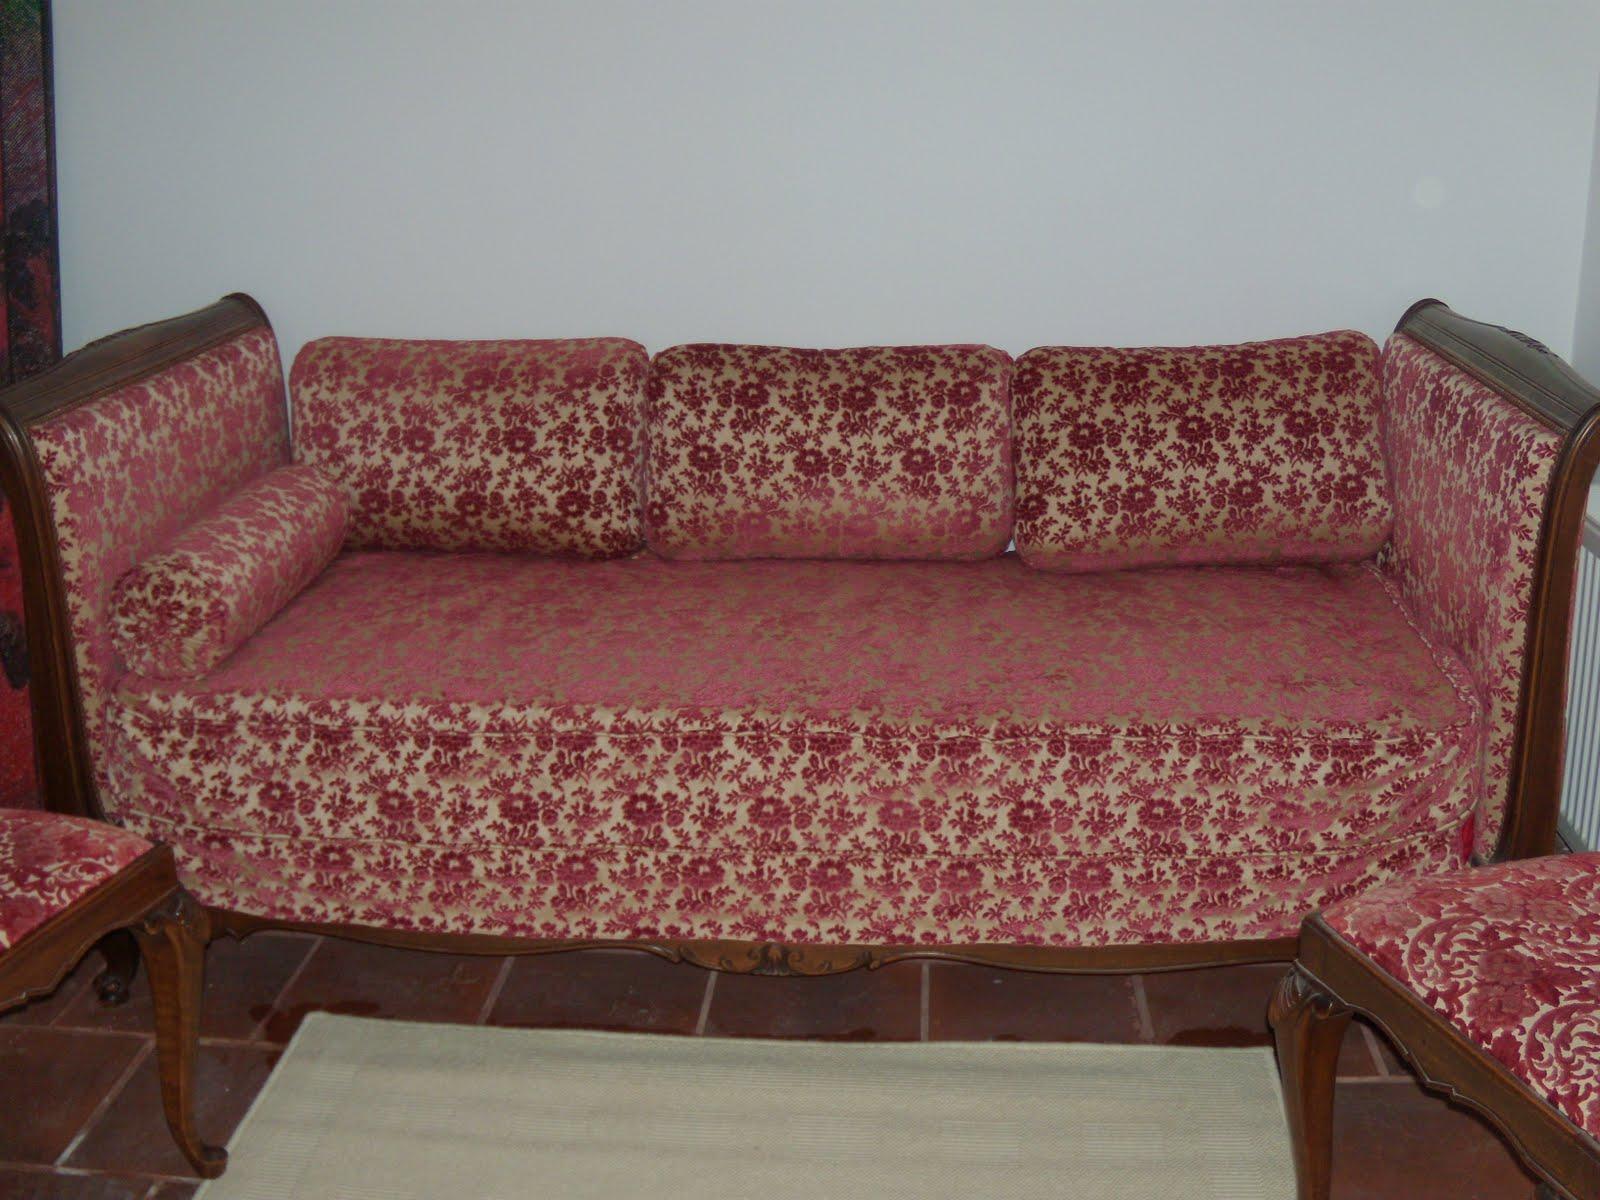 Venta garage sof cama estilo imperio estructura madera for Sofa cama 1 50 de ancho